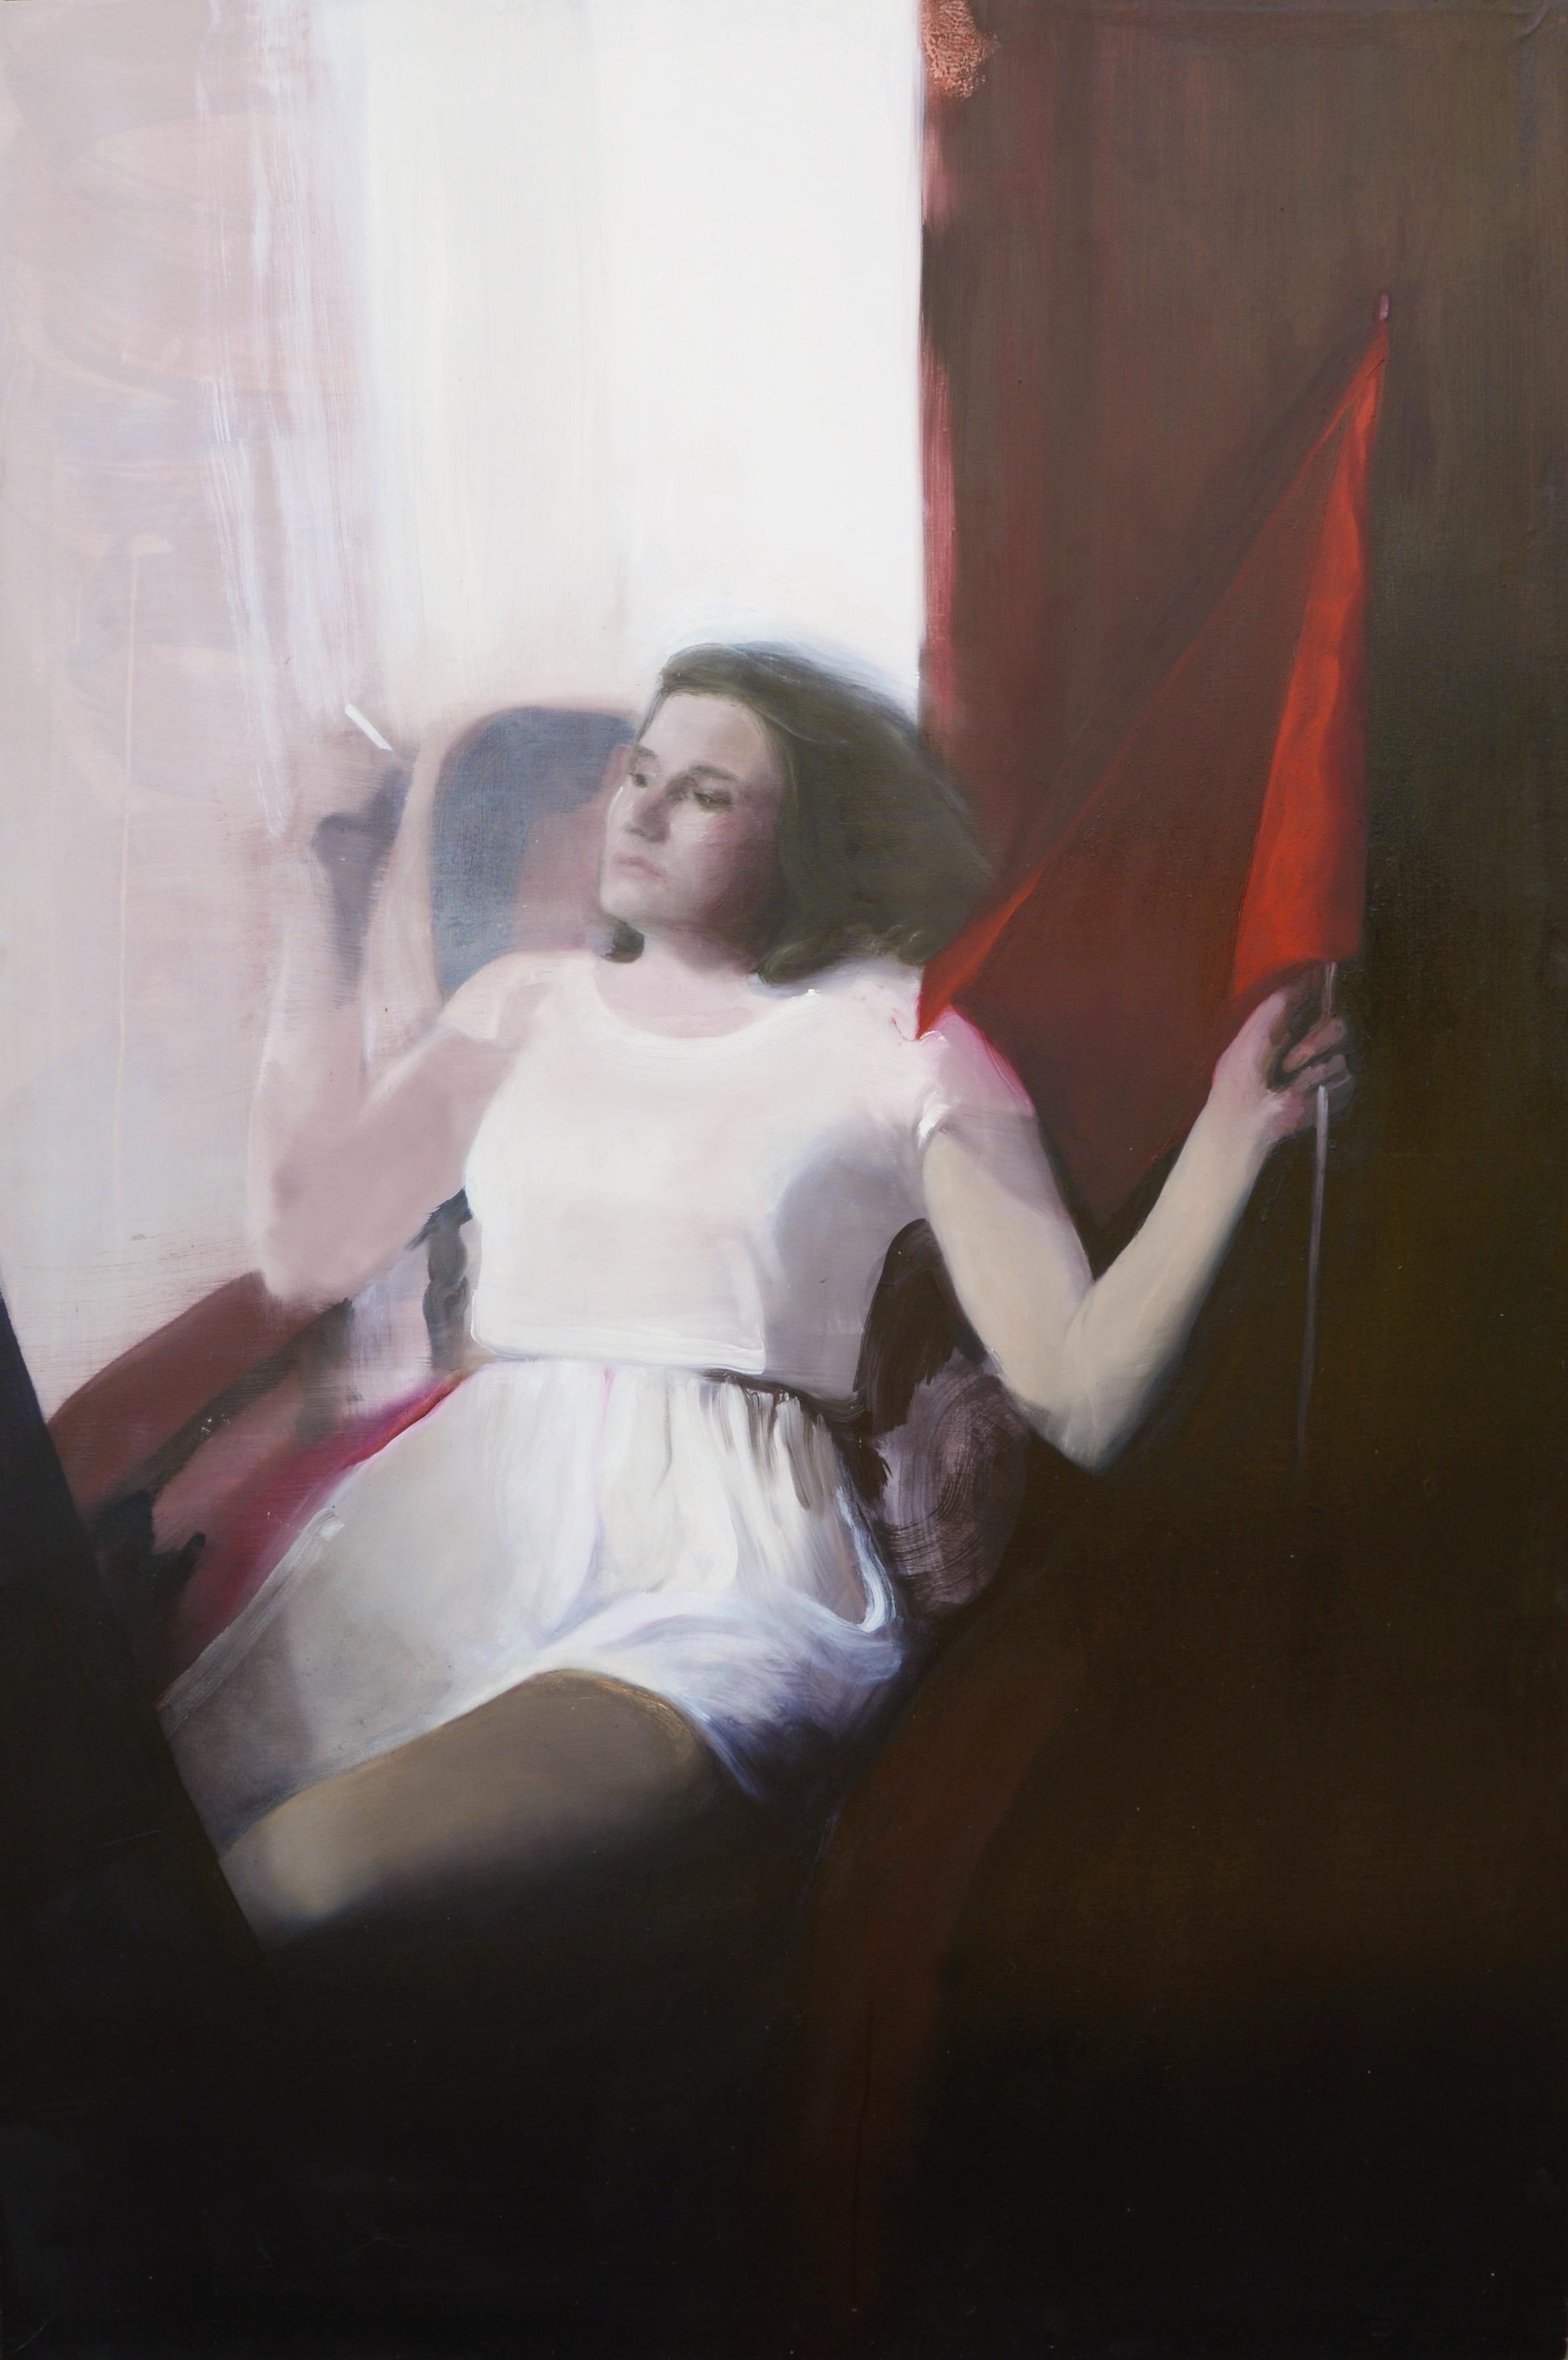 Sulltane, 2017, oil on canvas, 177x120 c